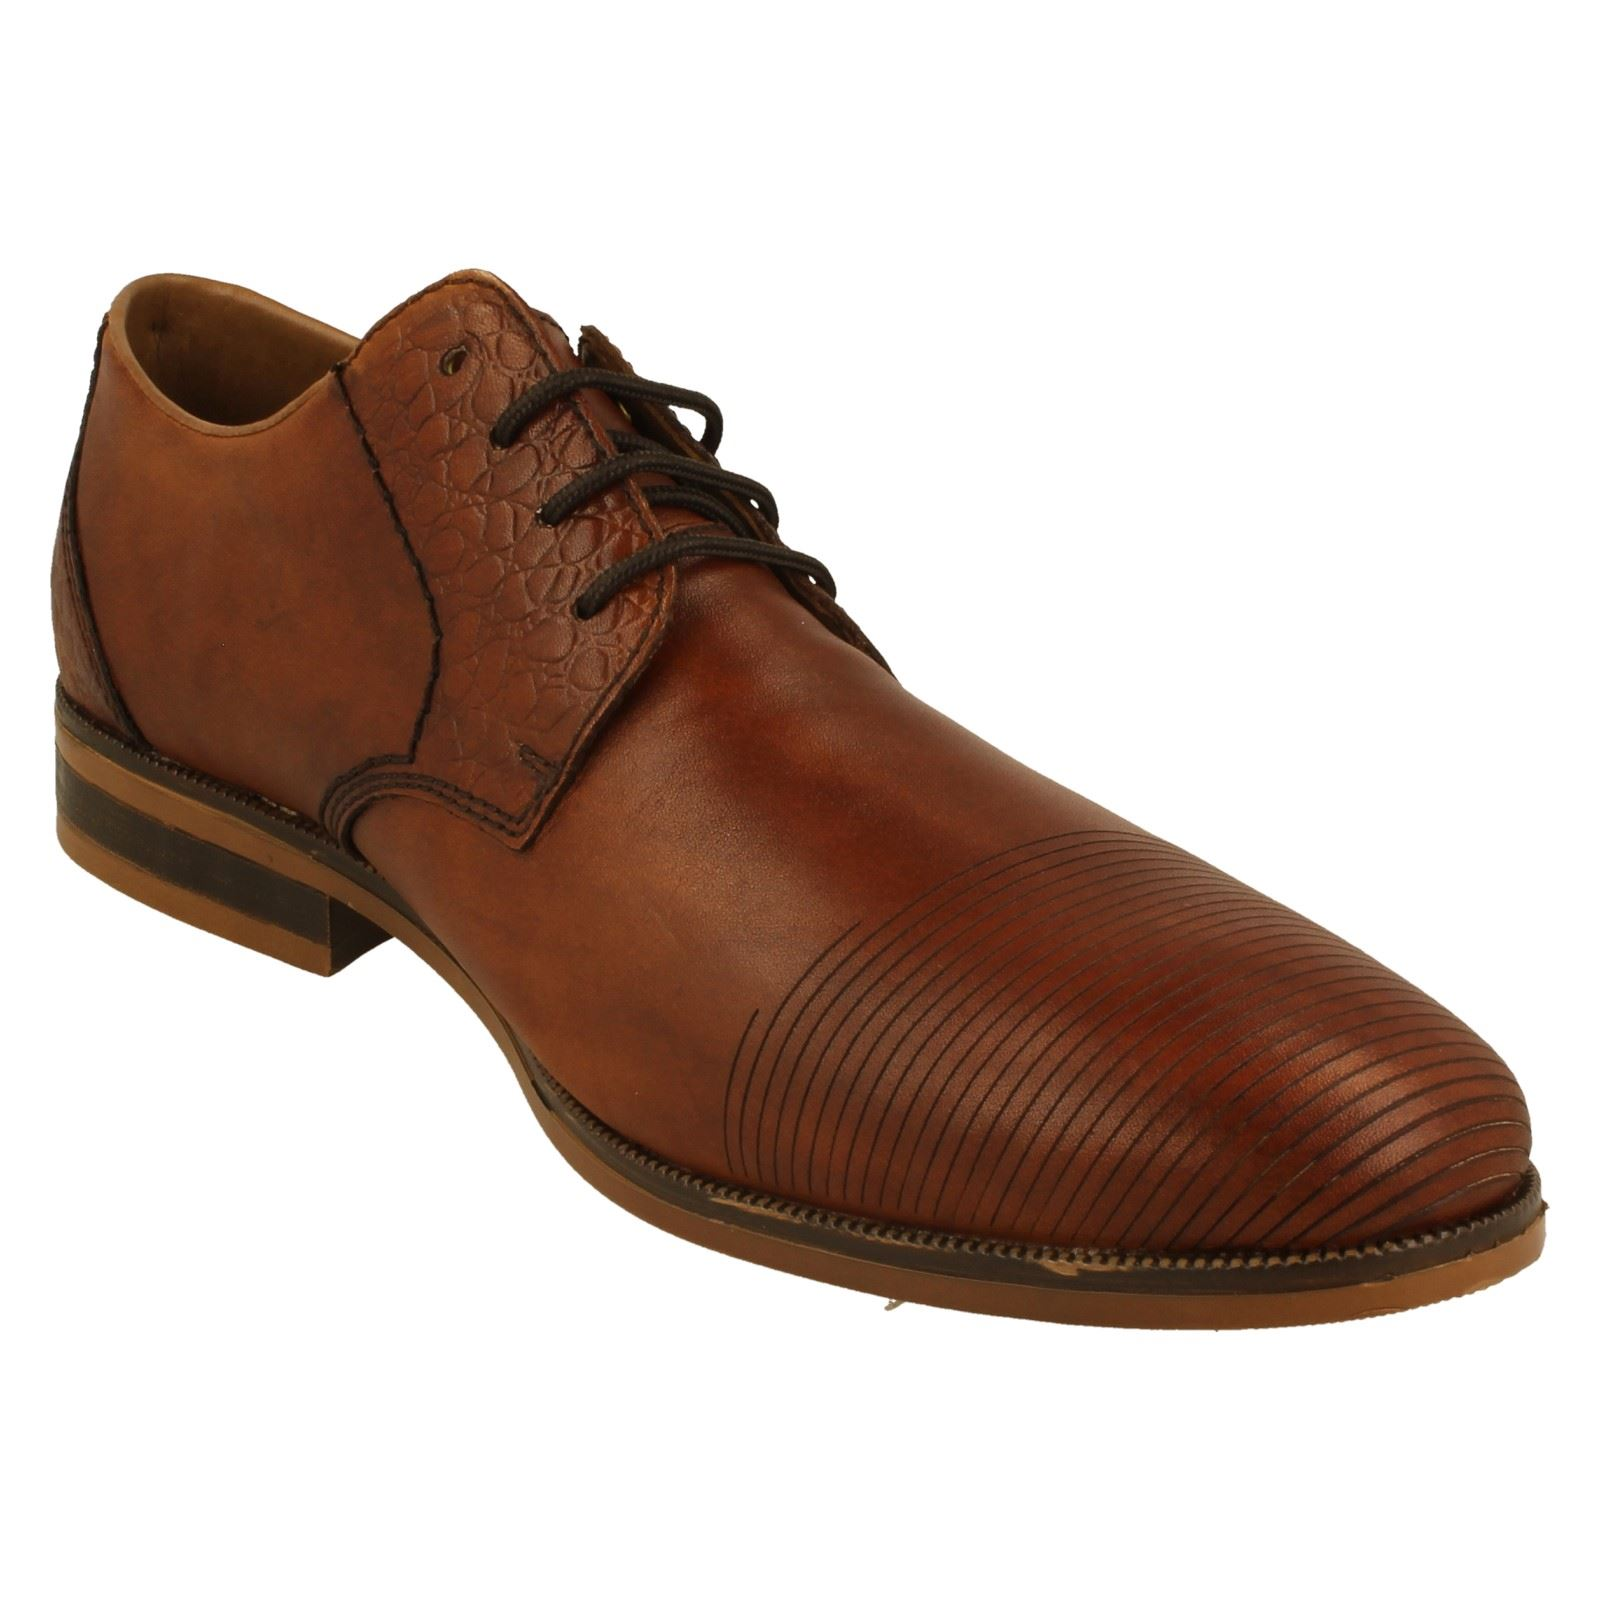 Billig gute Qualität Mens Rieker Shoes Label 11621-W